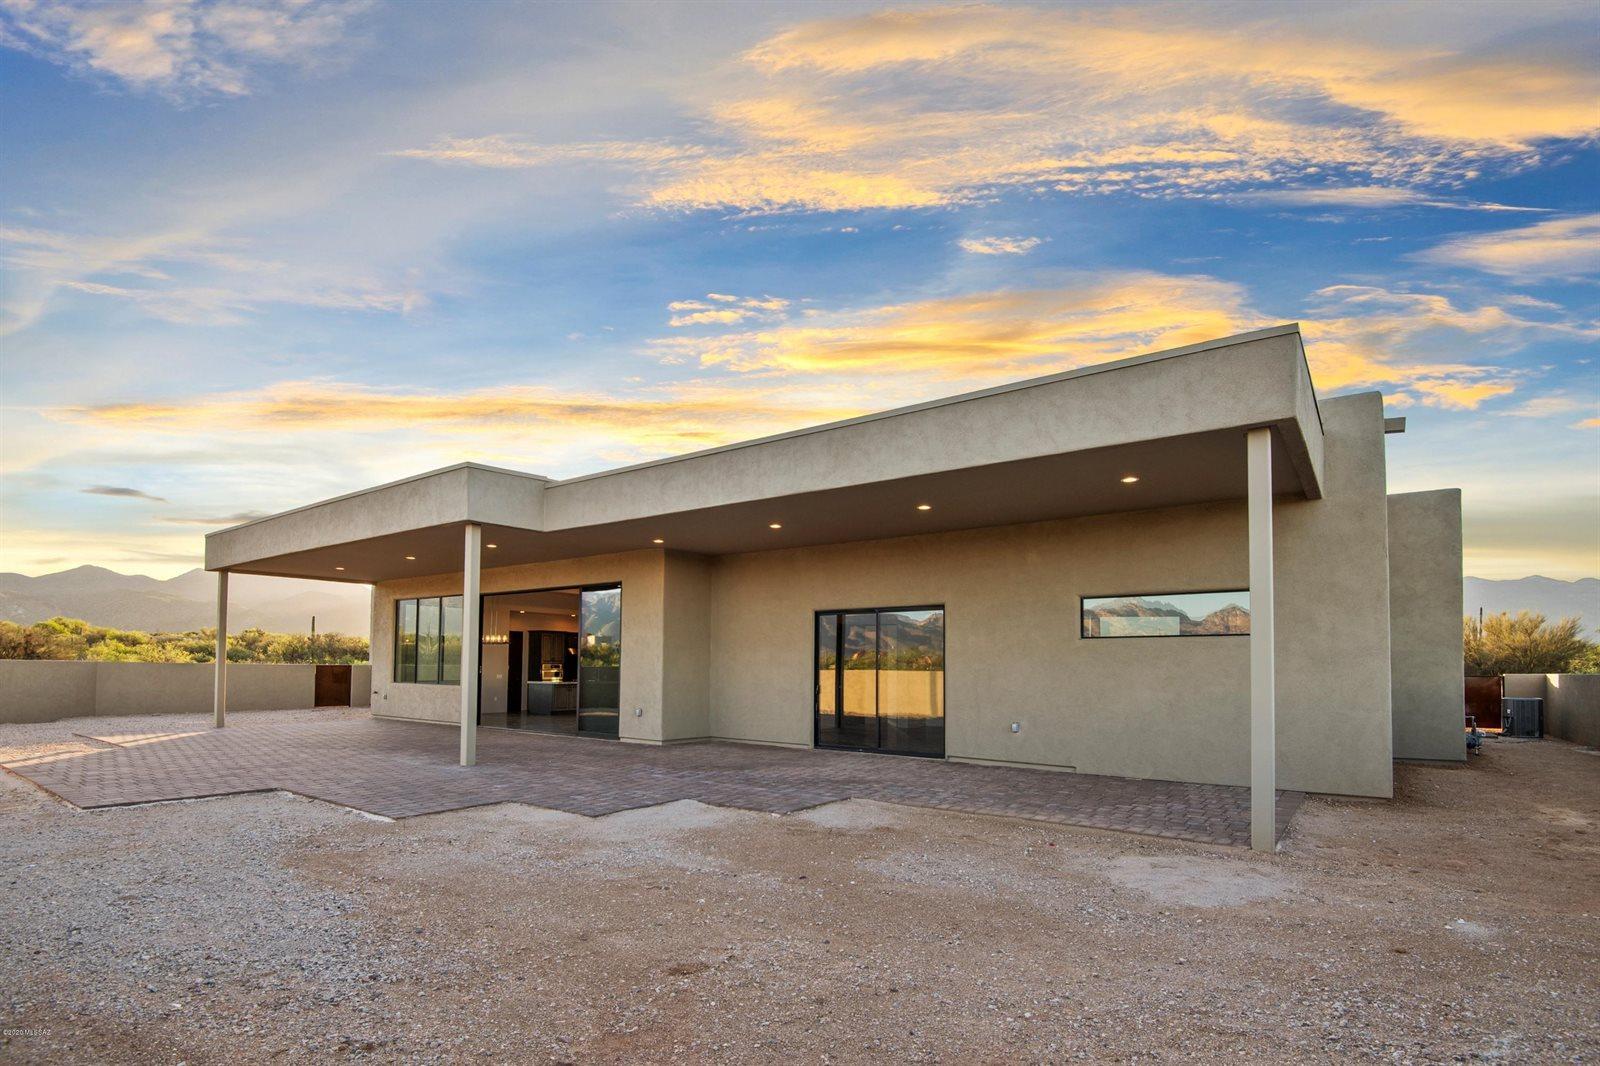 2920 North Megafauna Court, Tucson, AZ 85749